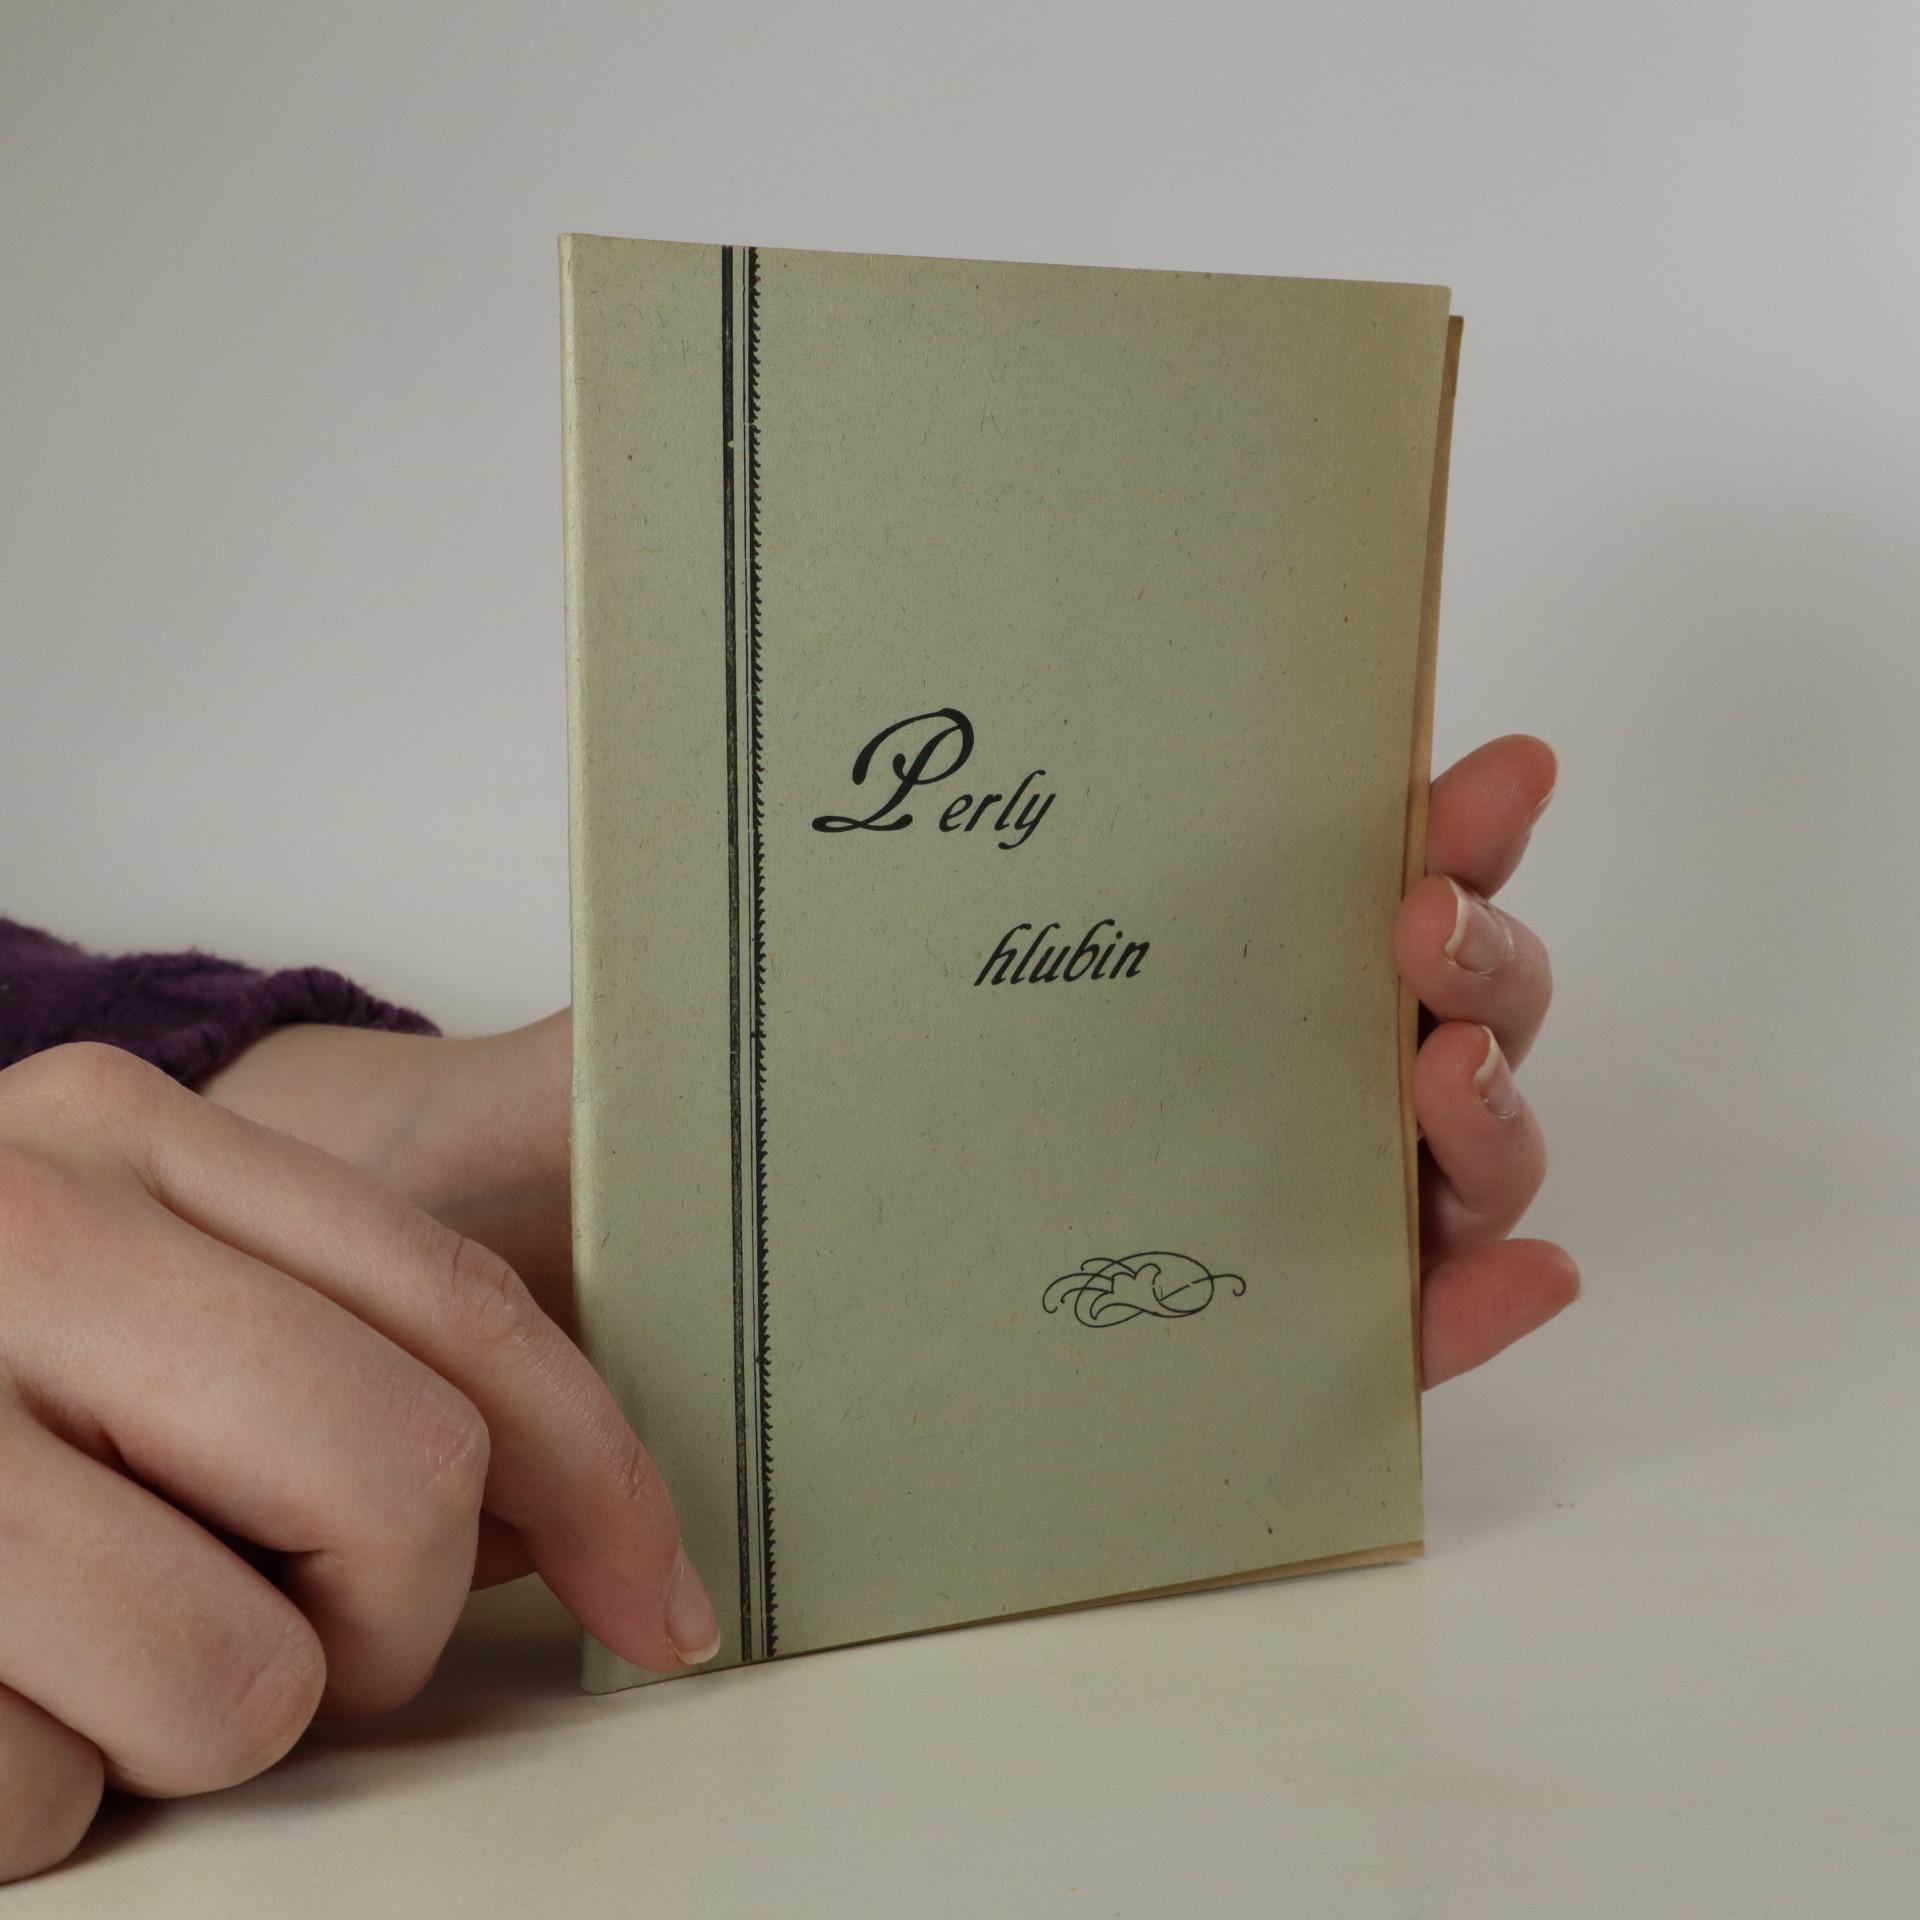 antikvární kniha Perly hlubin, neuveden